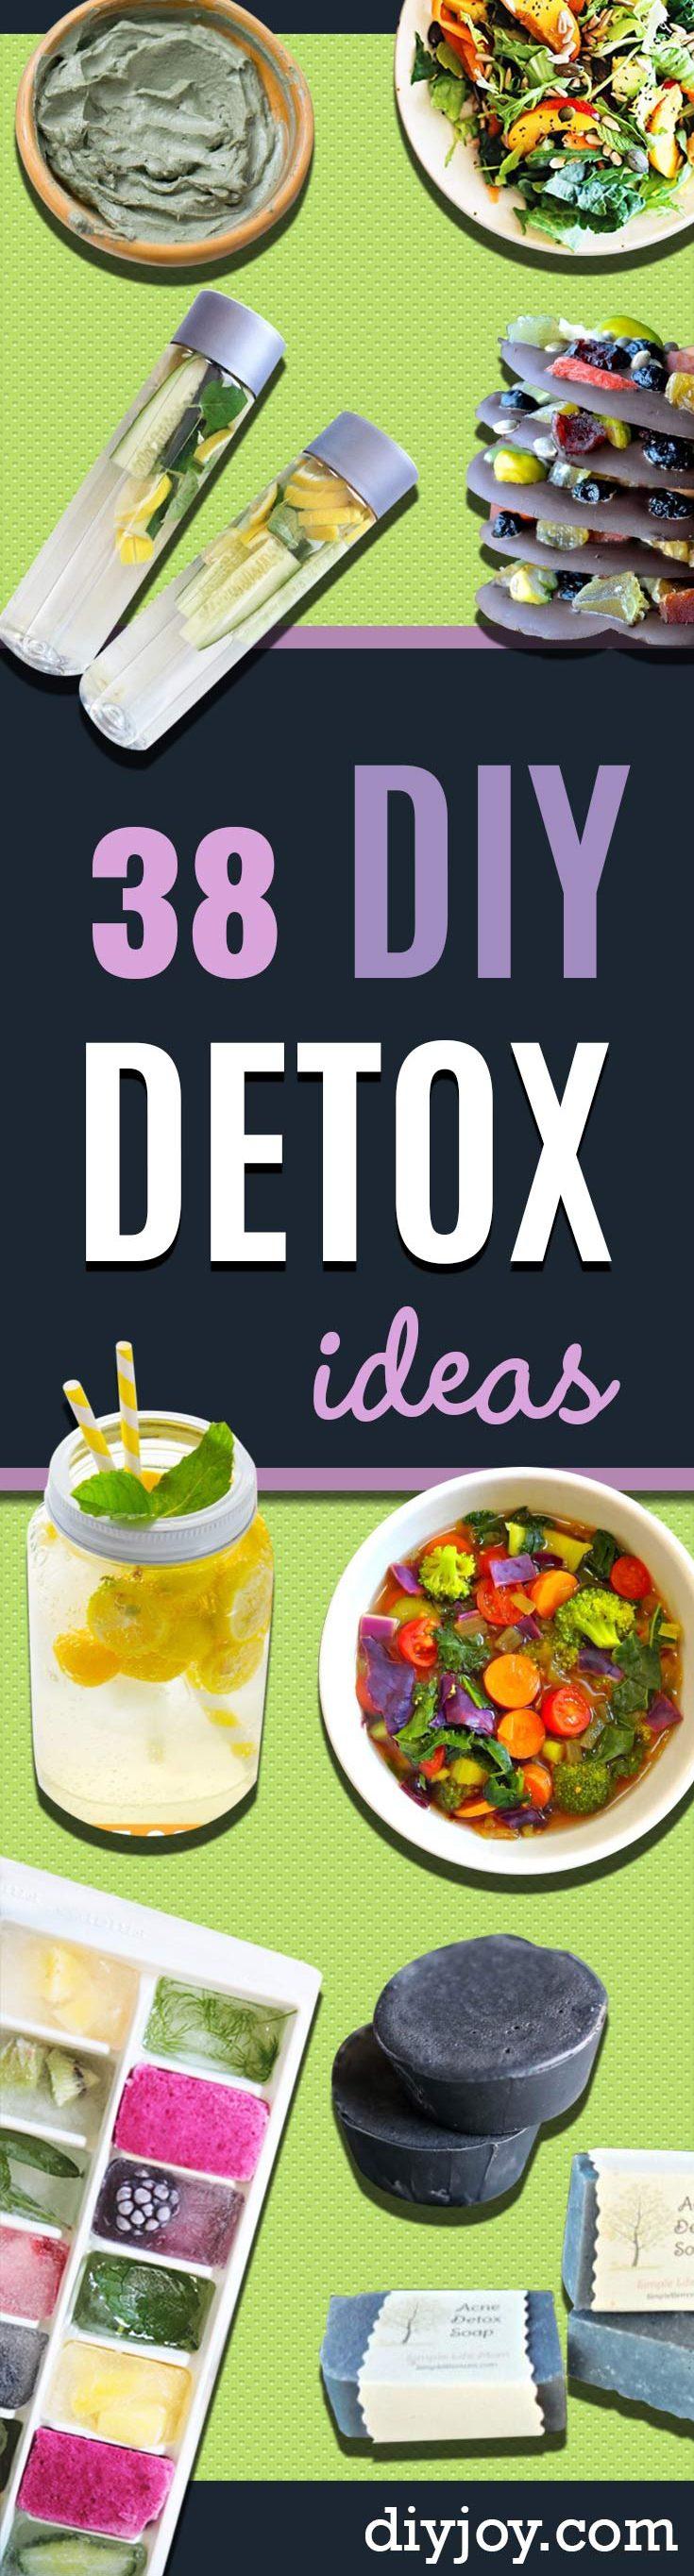 42 DIY Detox Ideas